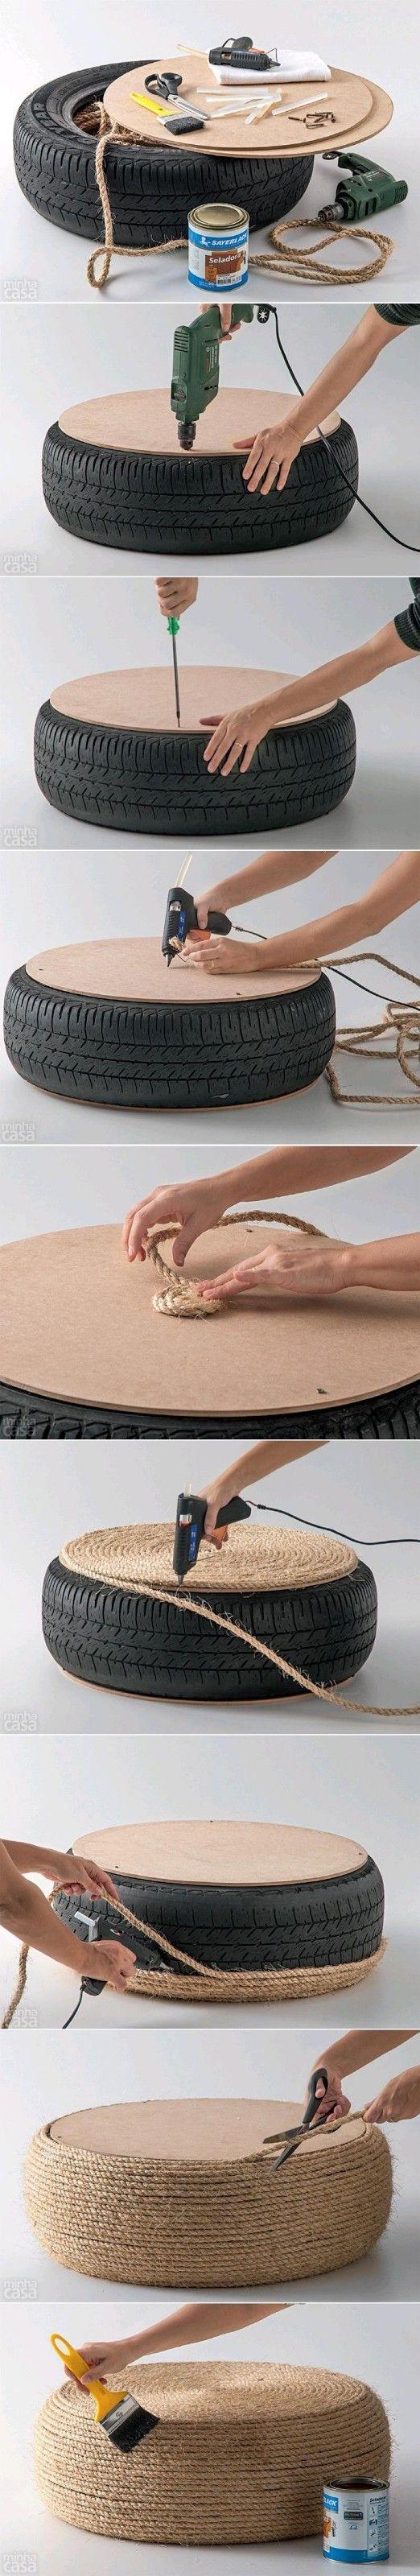 DIY Tire Ottoman